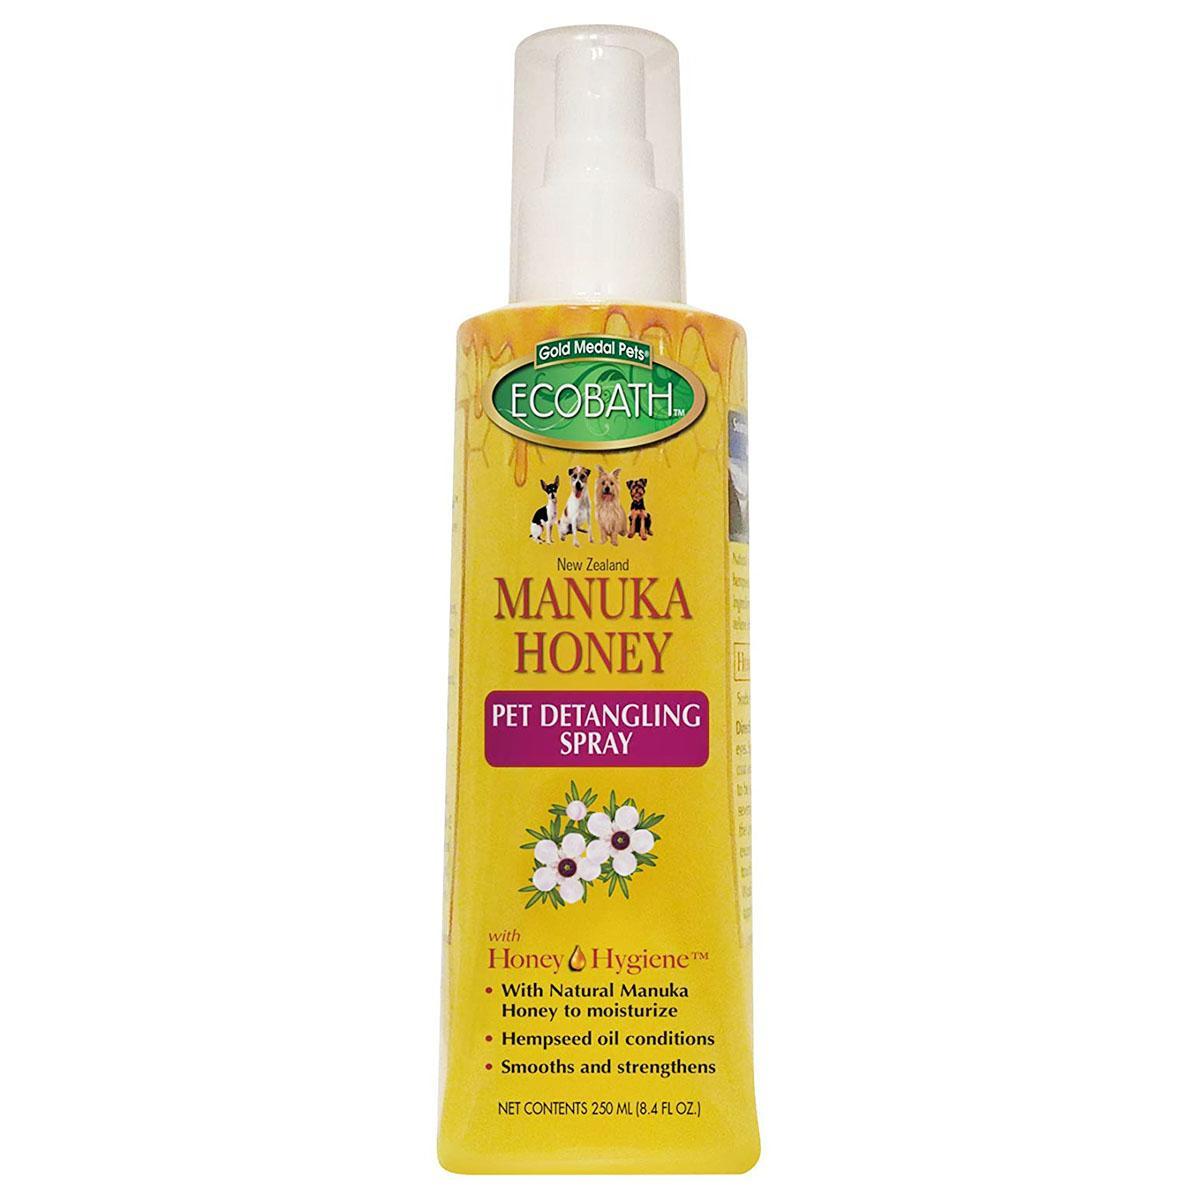 EcoBath Manuka Honey Pet Detangling Spray by Cardinal Pet Care